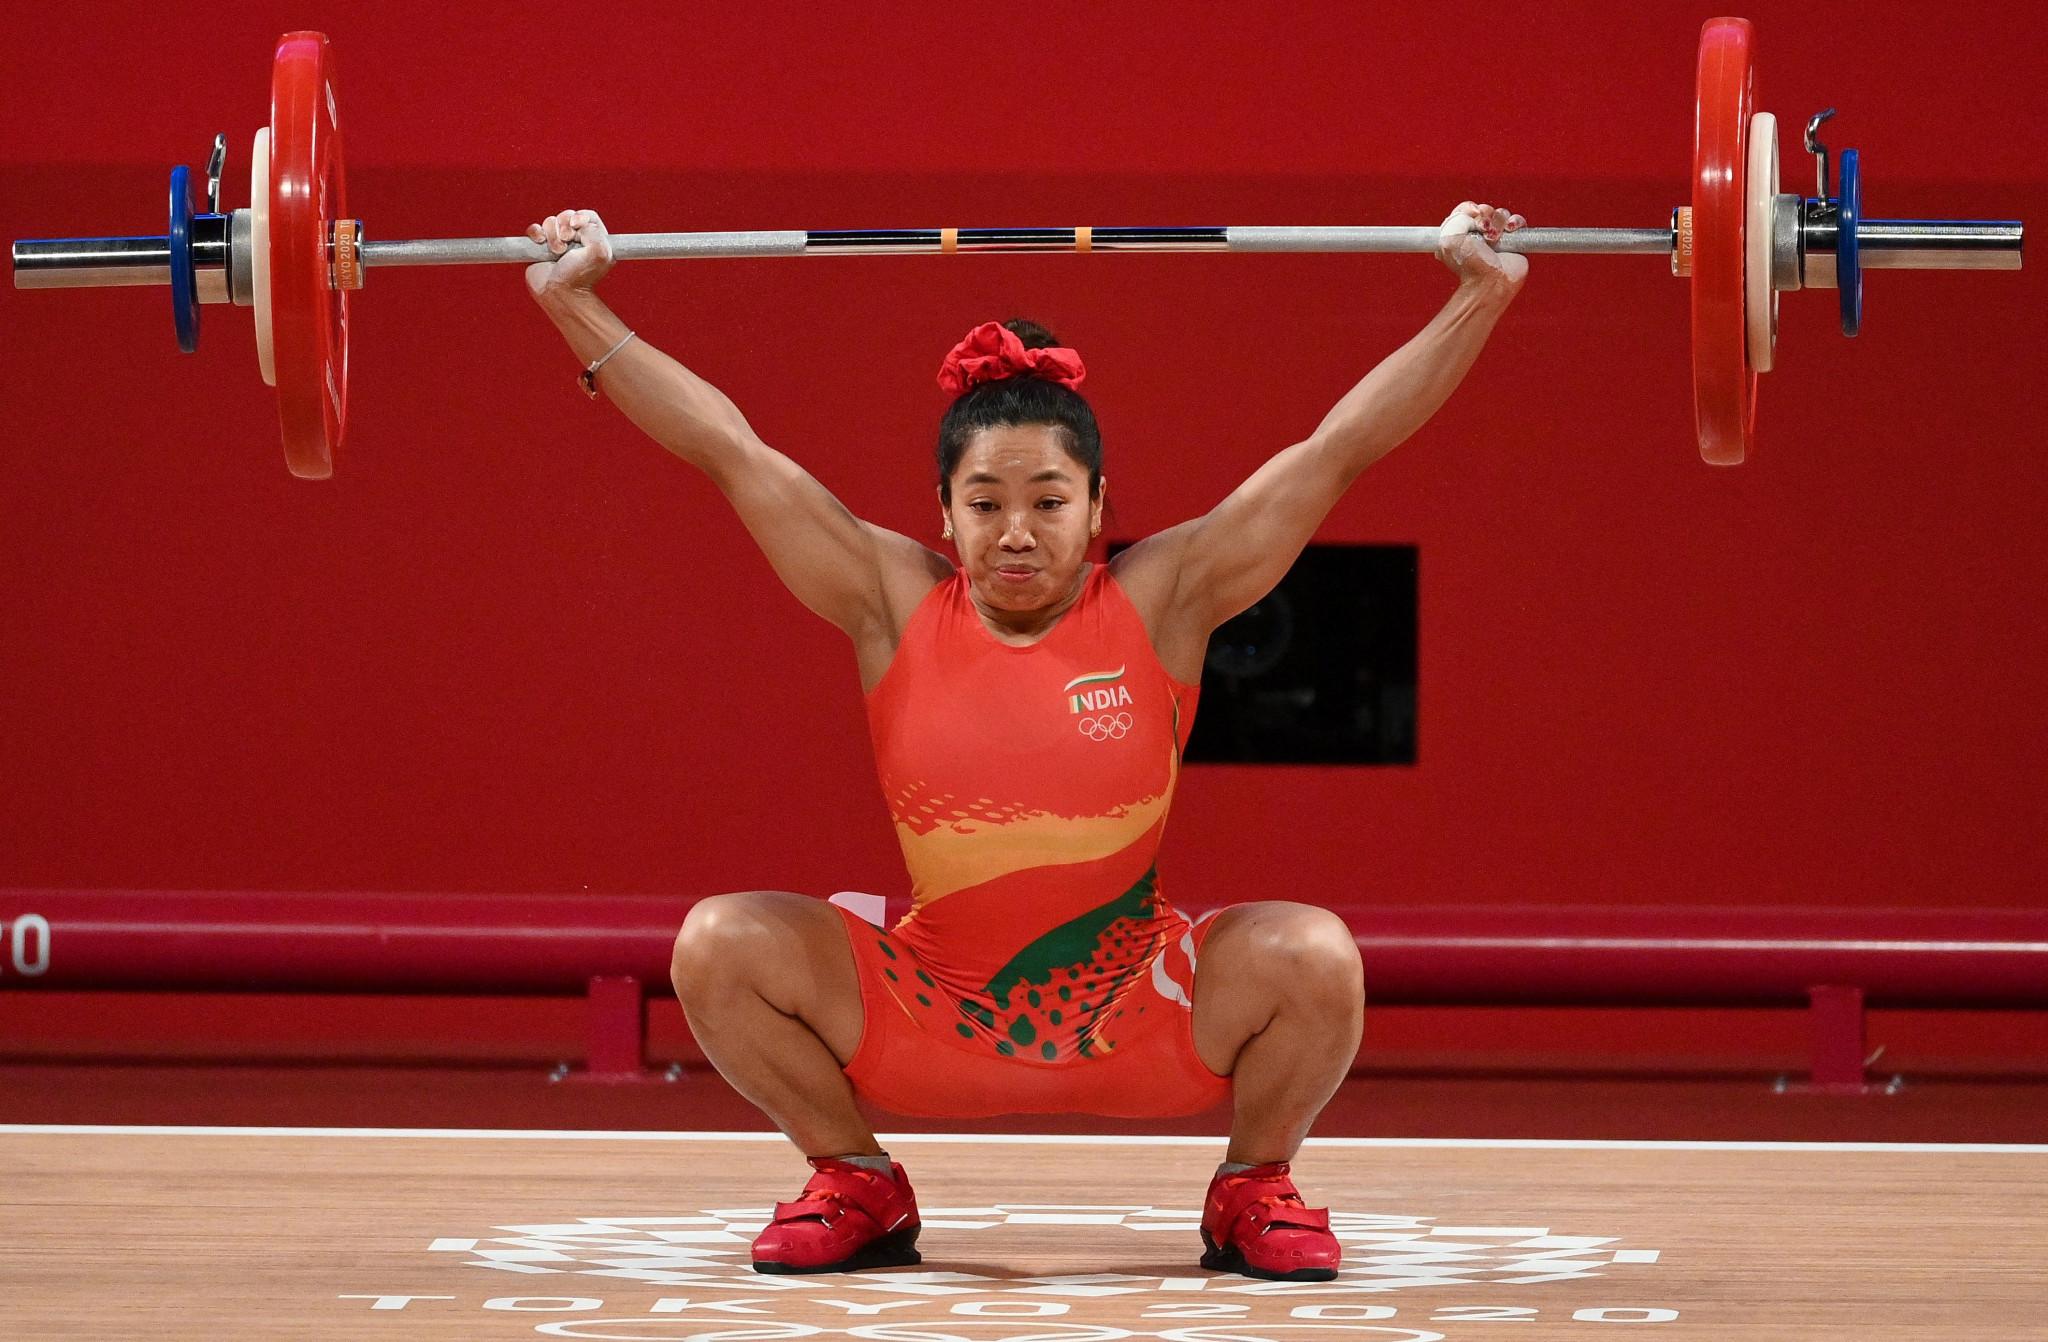 Mirabai aims to make history at 2022 Asian Games after winning Olympic silver medal